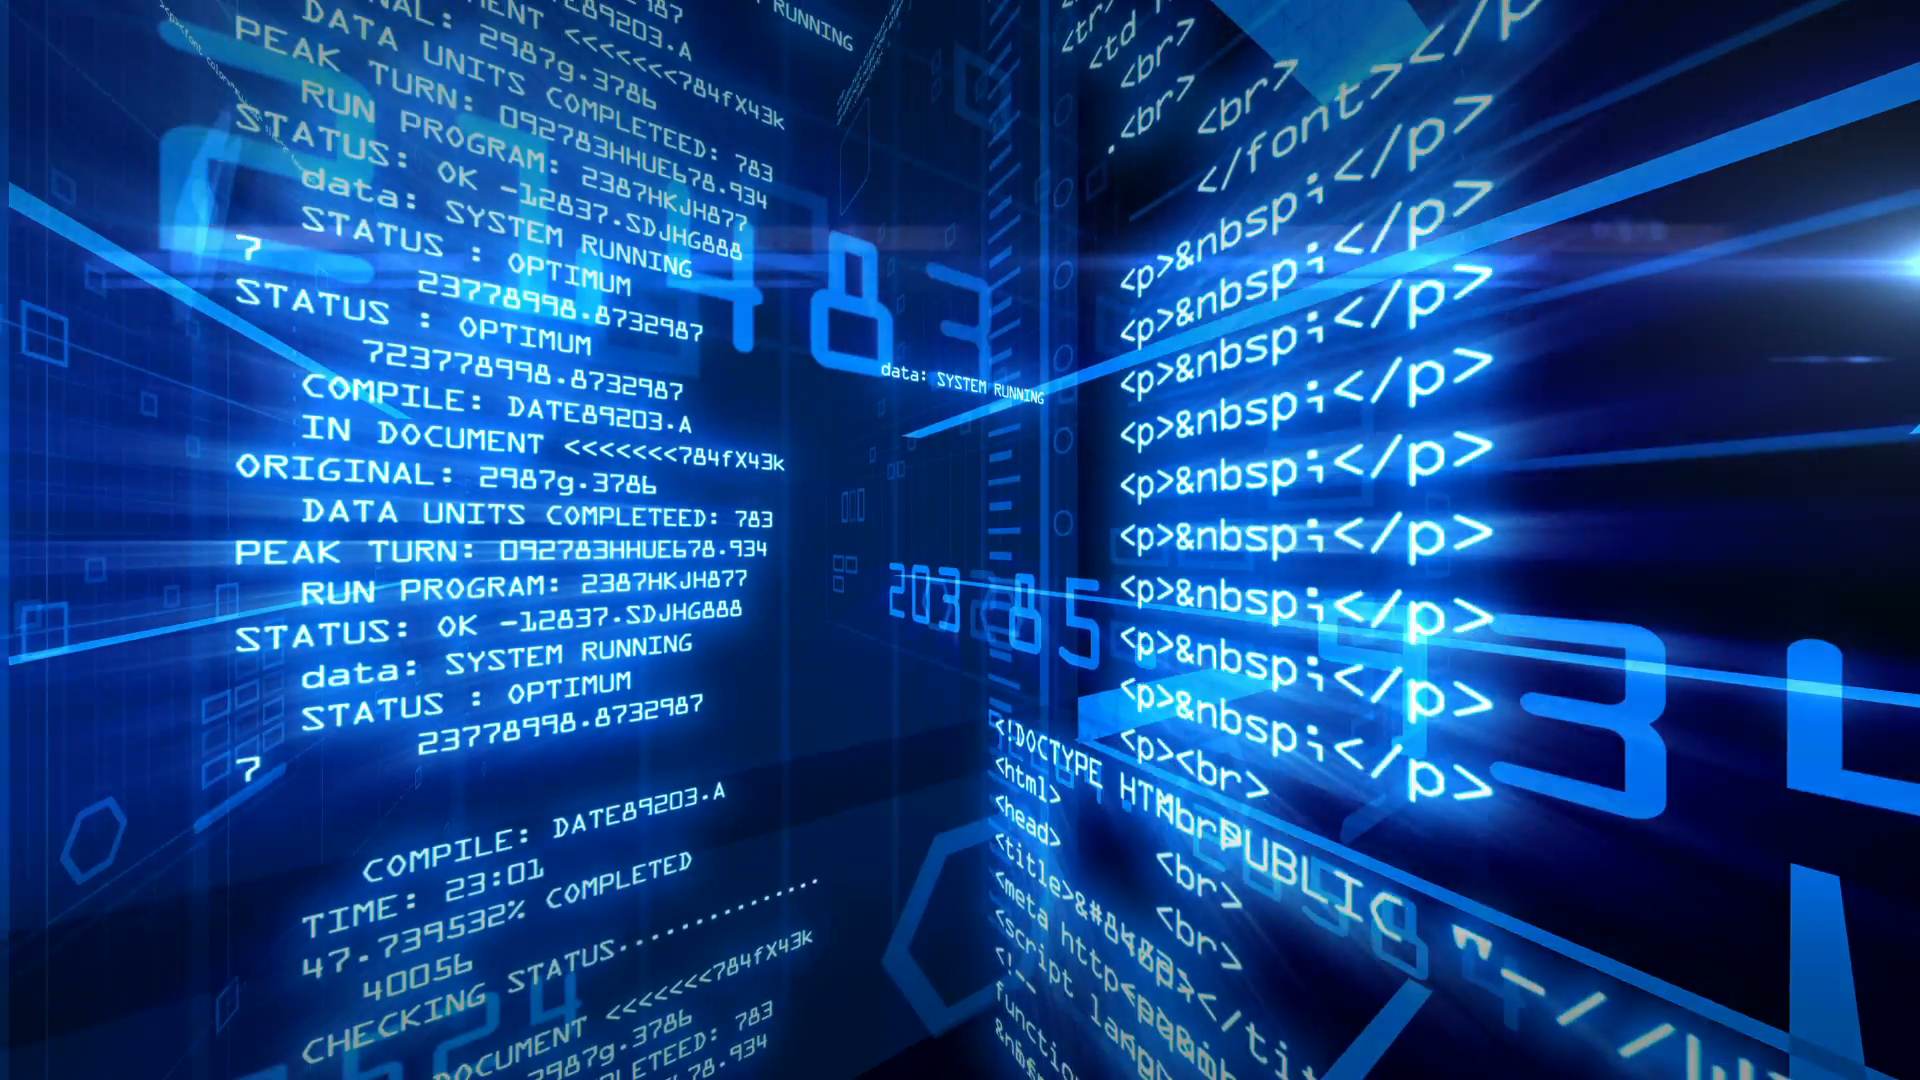 data-code-digital-technology-animation_vjgipxk24x__F0000